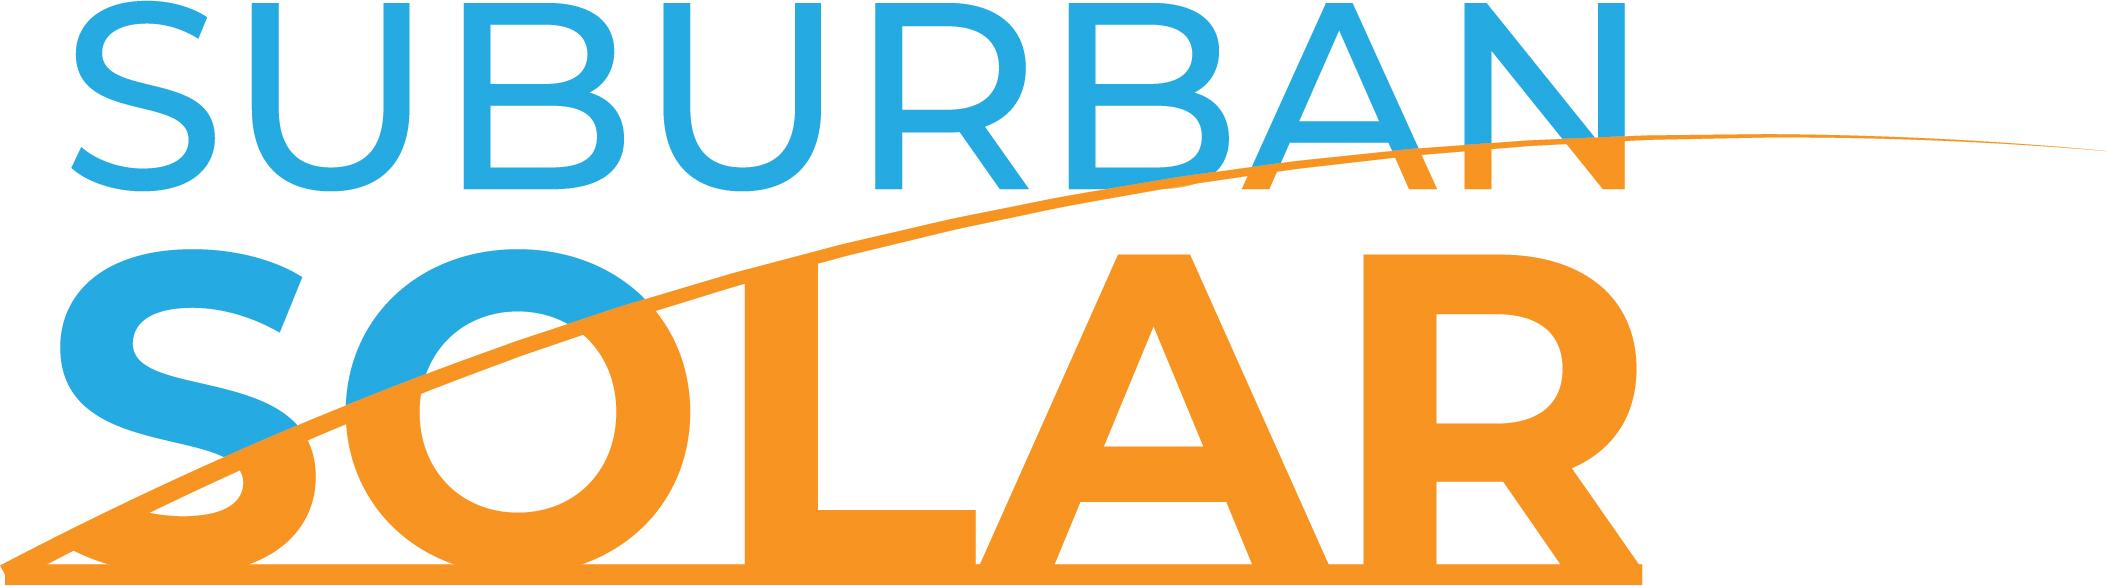 suburban solar.jpg